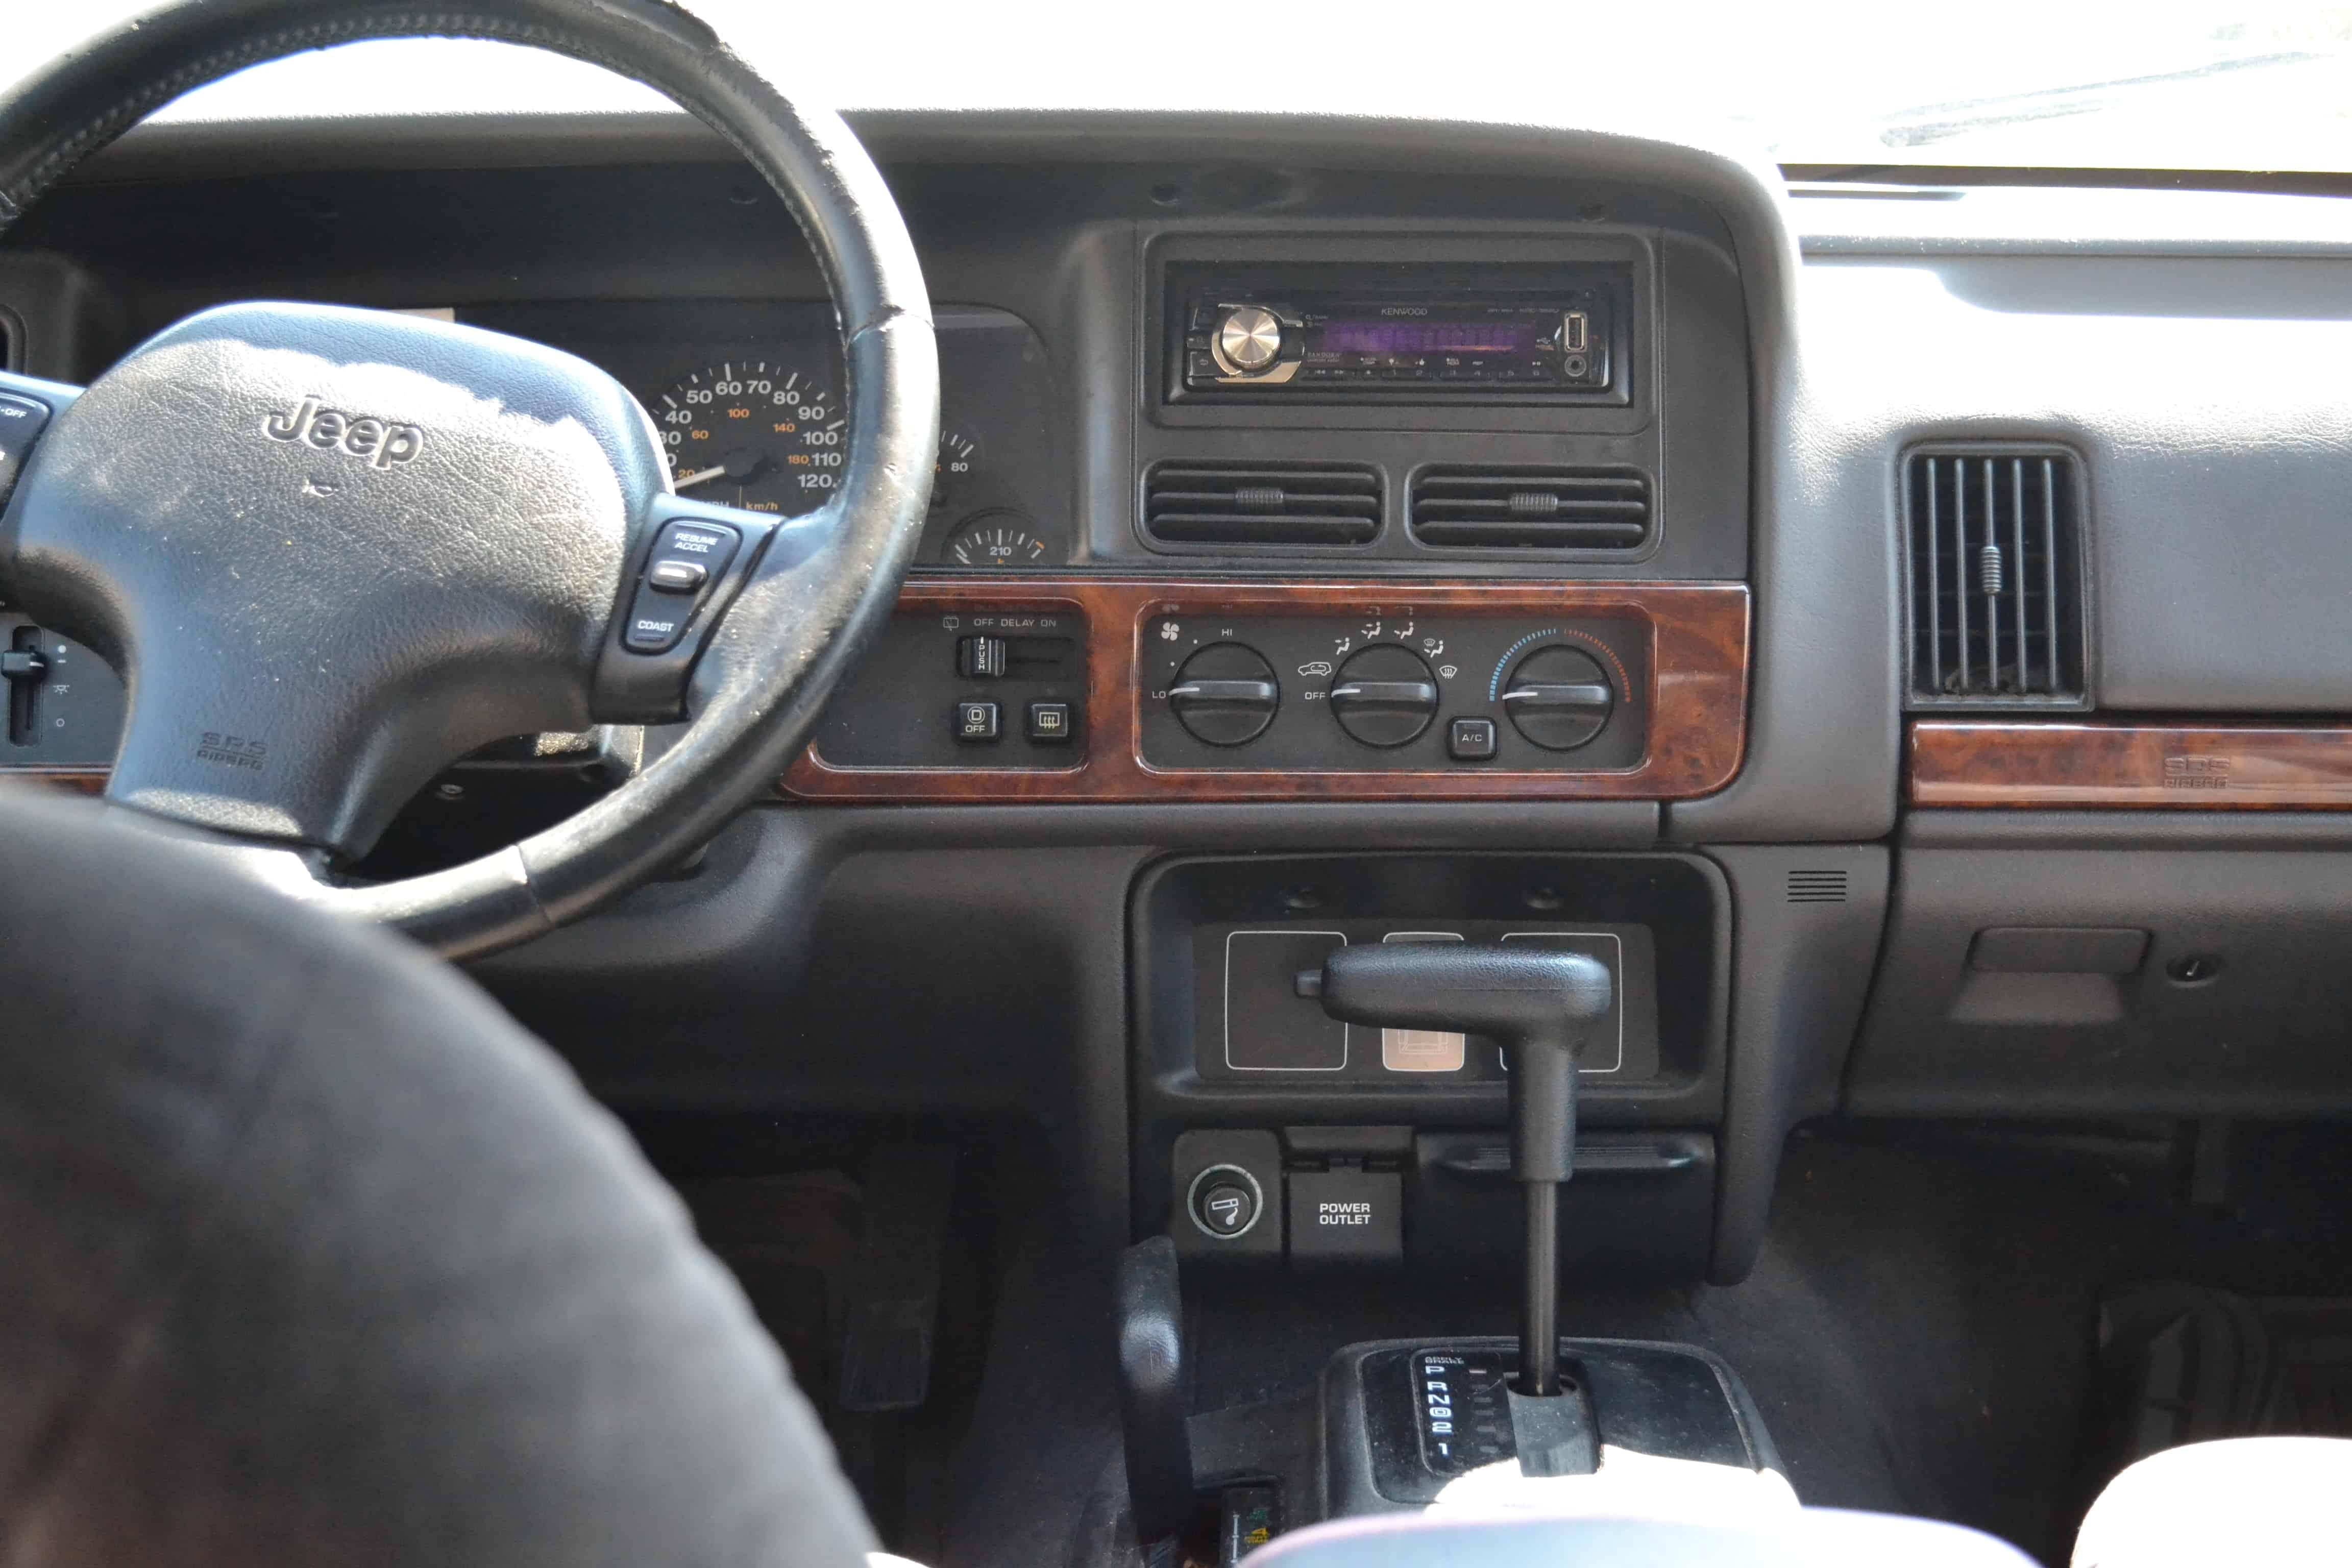 1997 Jeep Grand Cherokee Laredo Dashboard